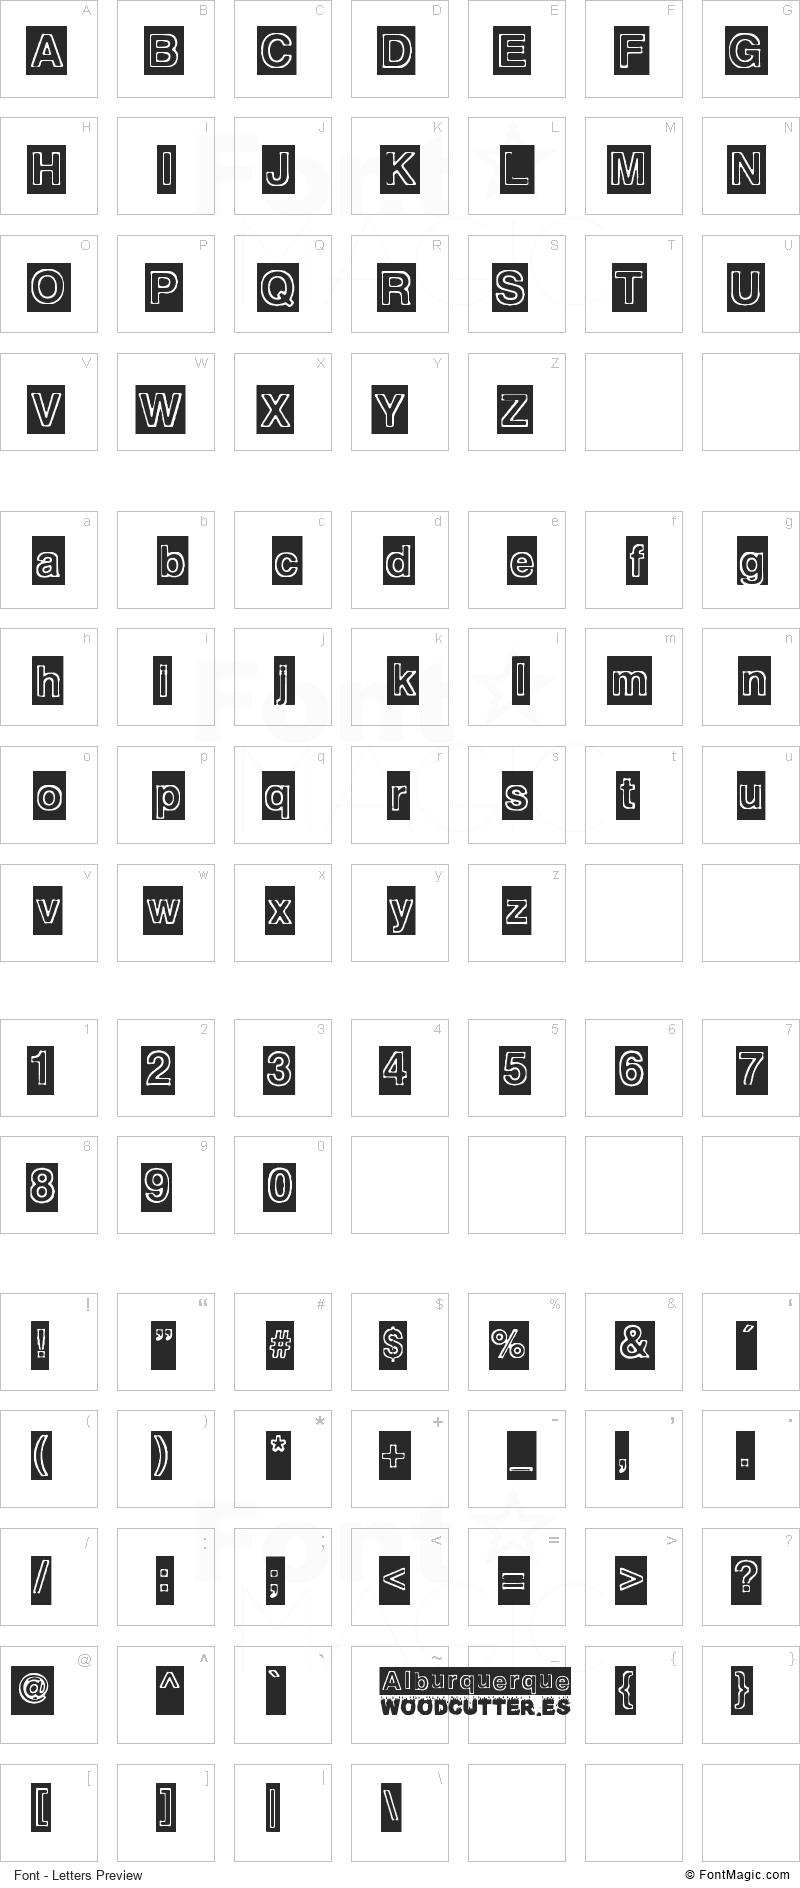 Alburquerque Font - All Latters Preview Chart